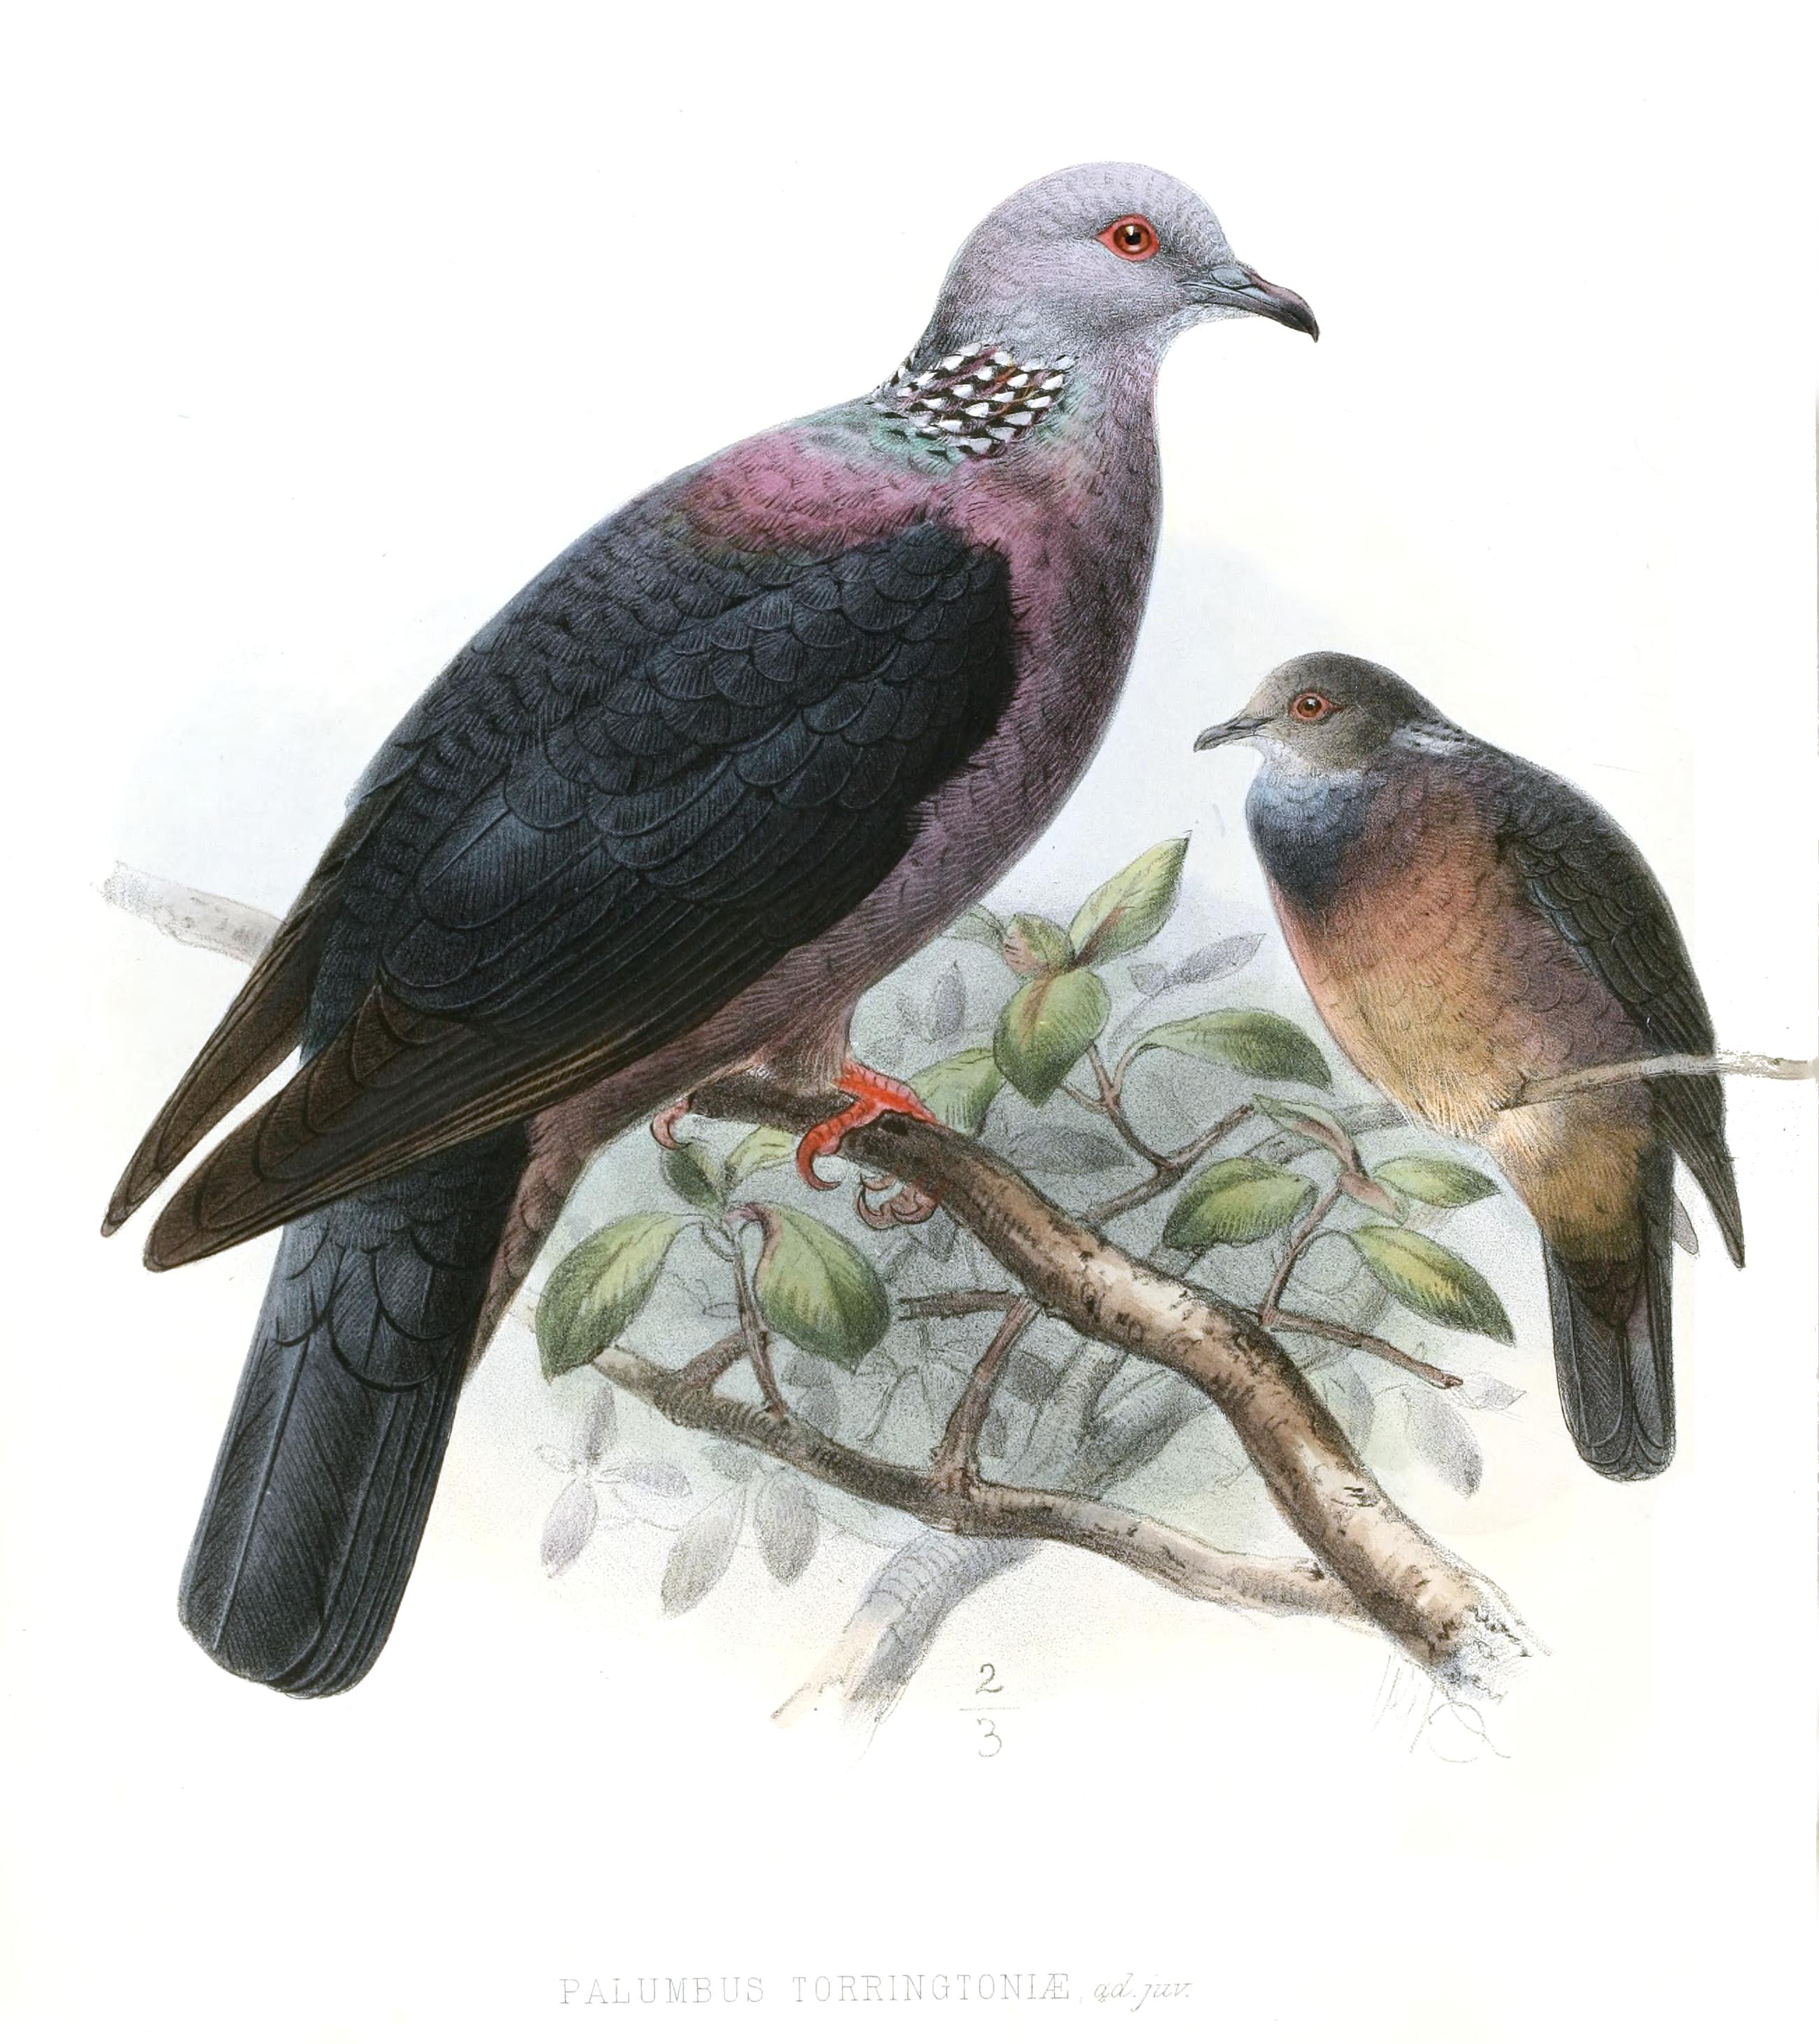 Sri Lanka Wood Pigeon Wikipedia